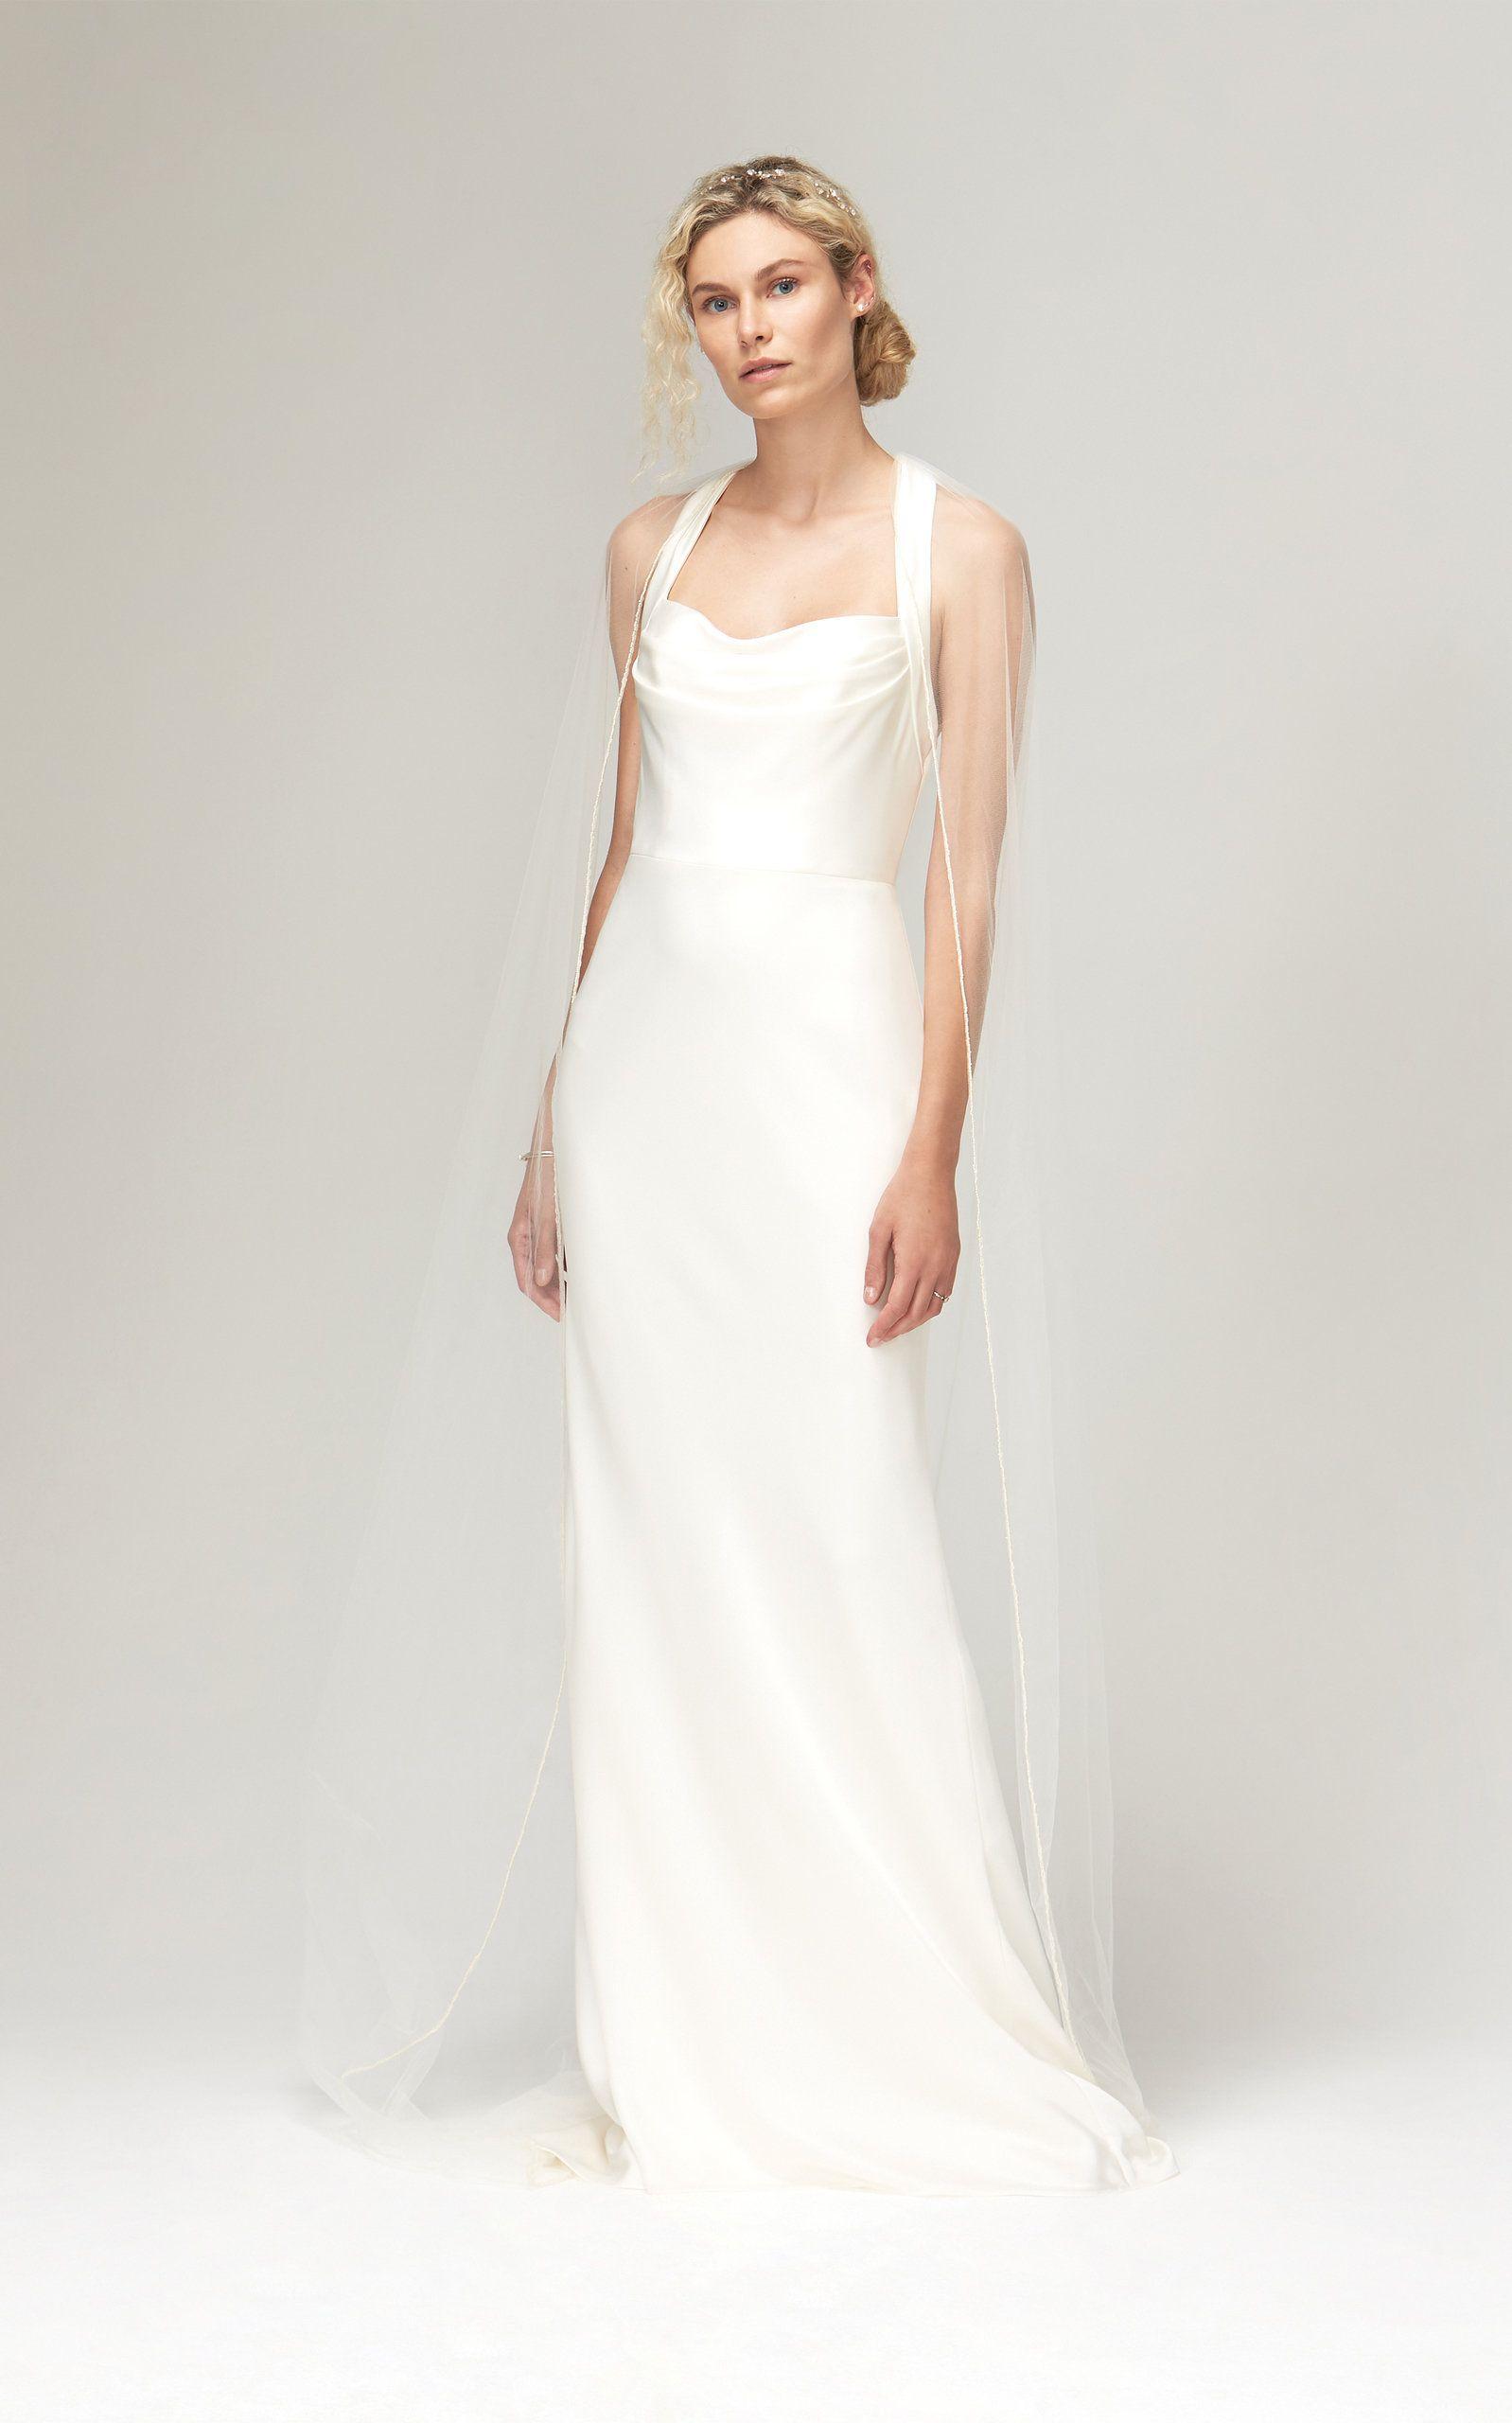 Astrid Cowl Neck Halter Gown With Train By Savannah Miller For Preorder On Moda Operandi Bohemian Wedding Dresses Sheath Wedding Dress Bohemian Wedding Gown